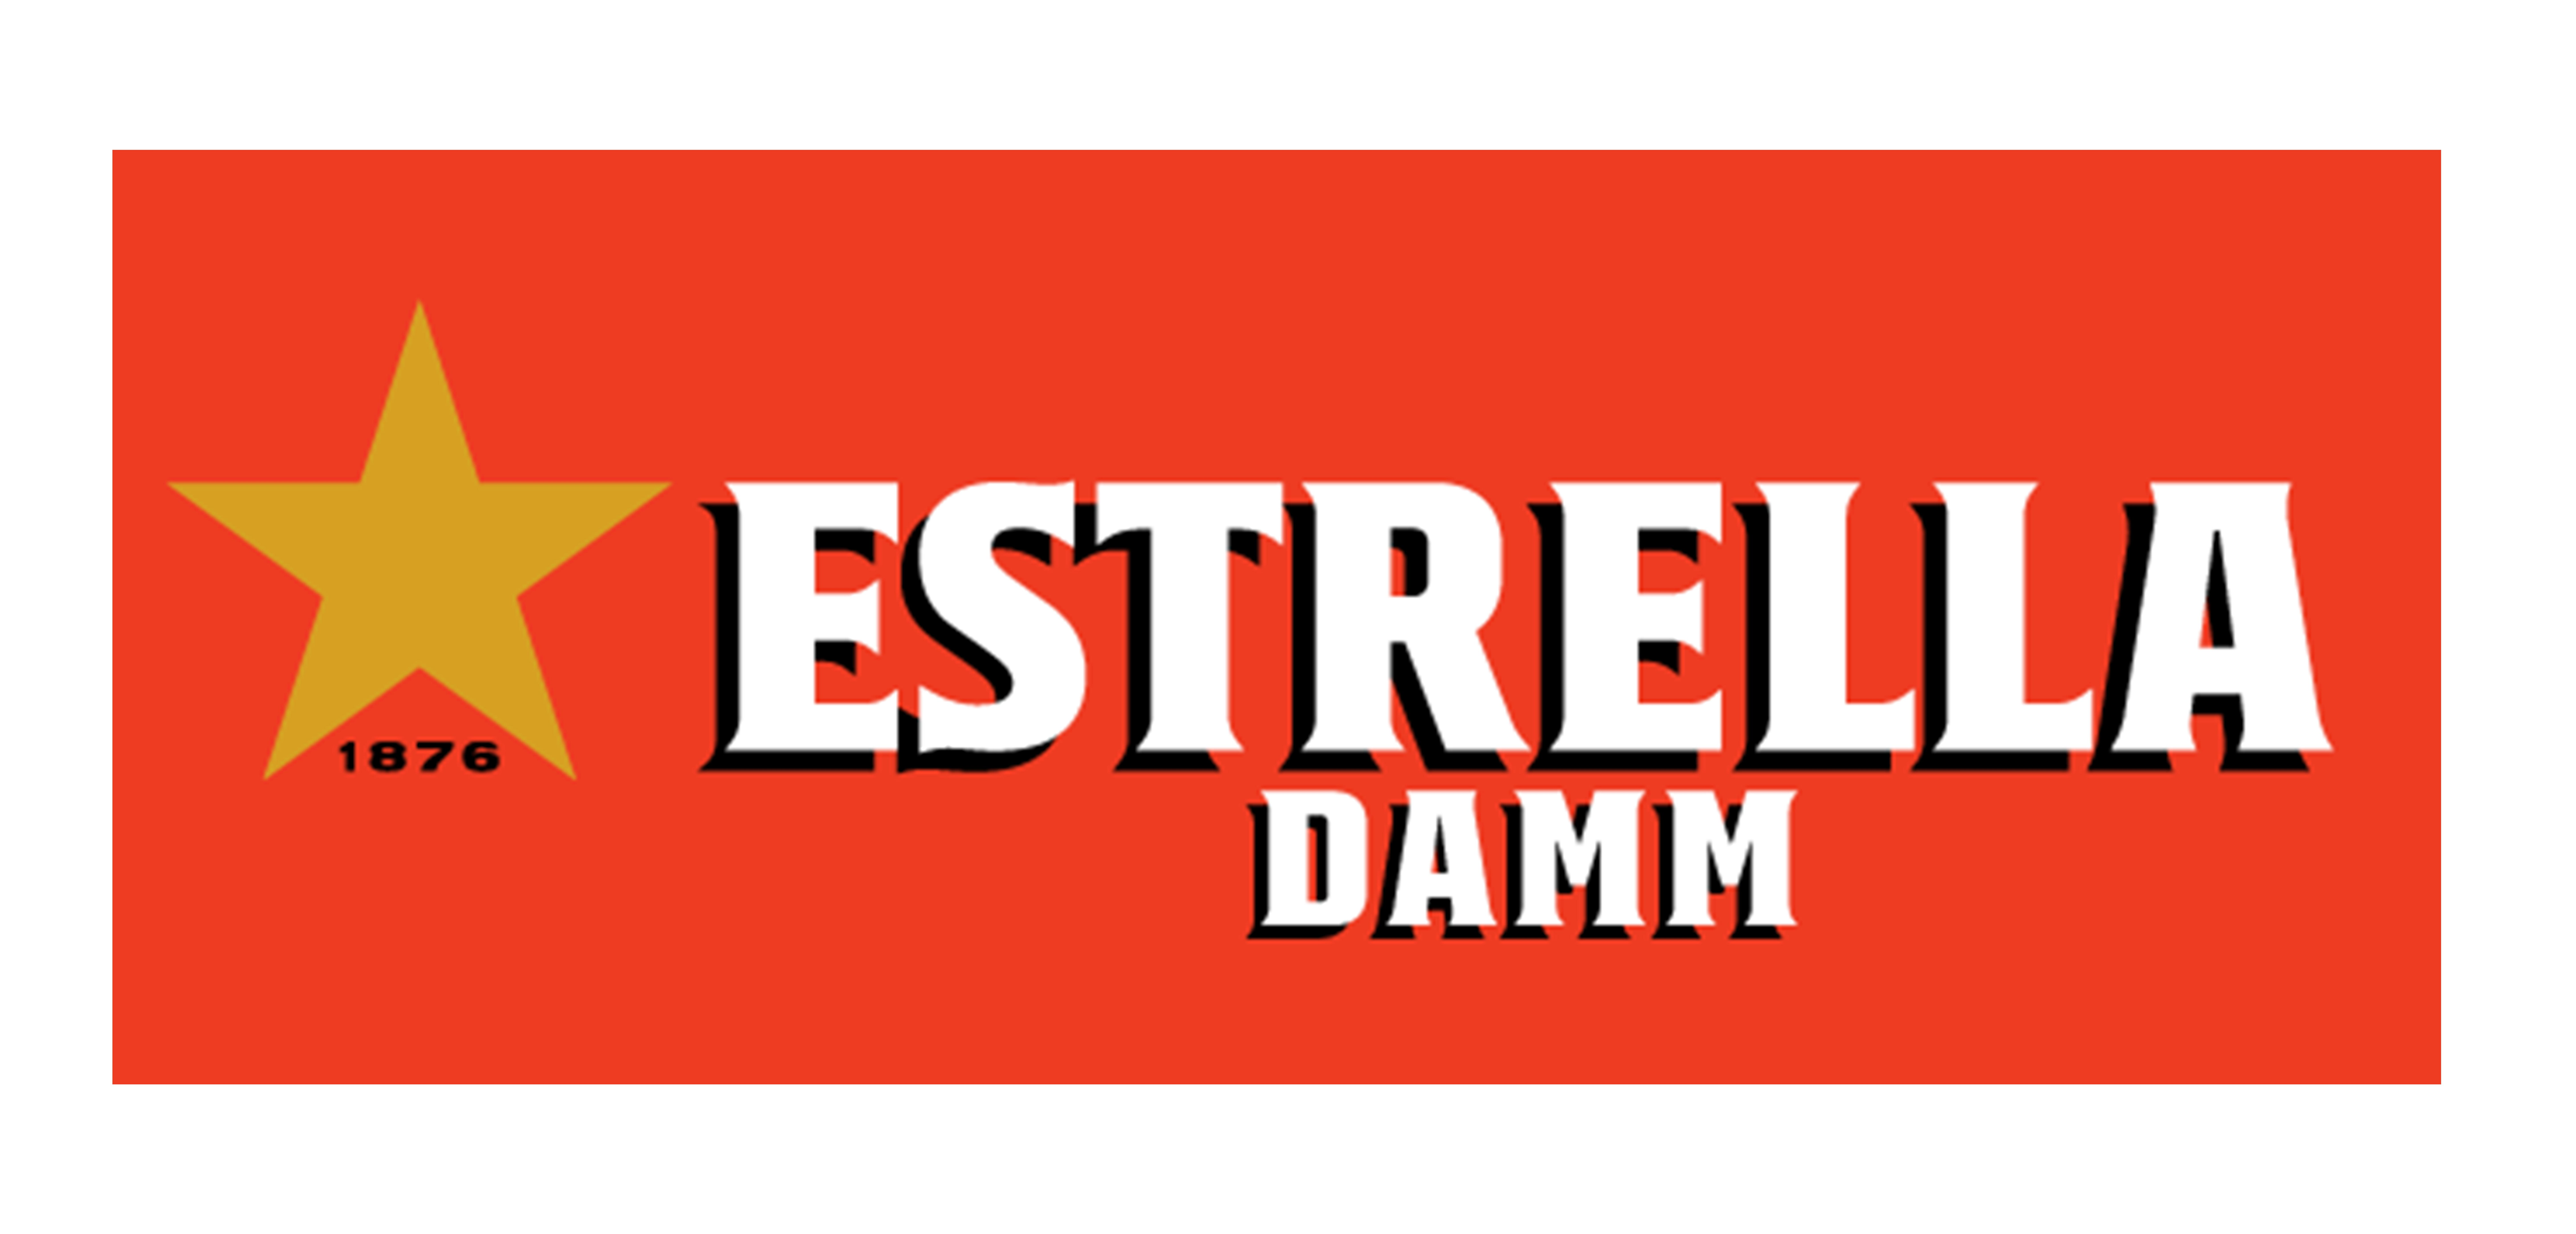 https://www.estrelladamm.com/